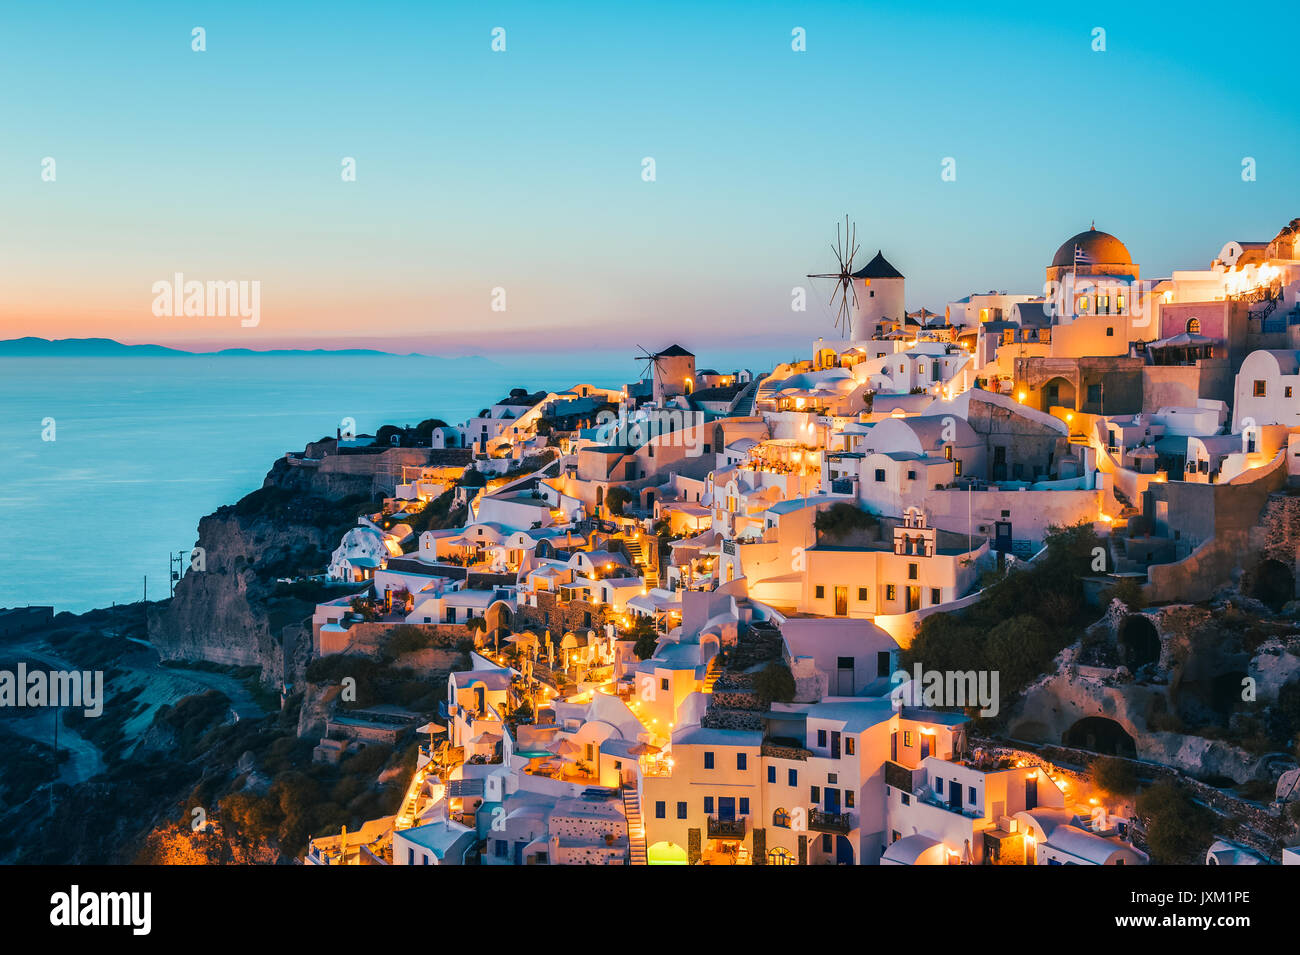 Oia Santorini Greece at dusk - Stock Image